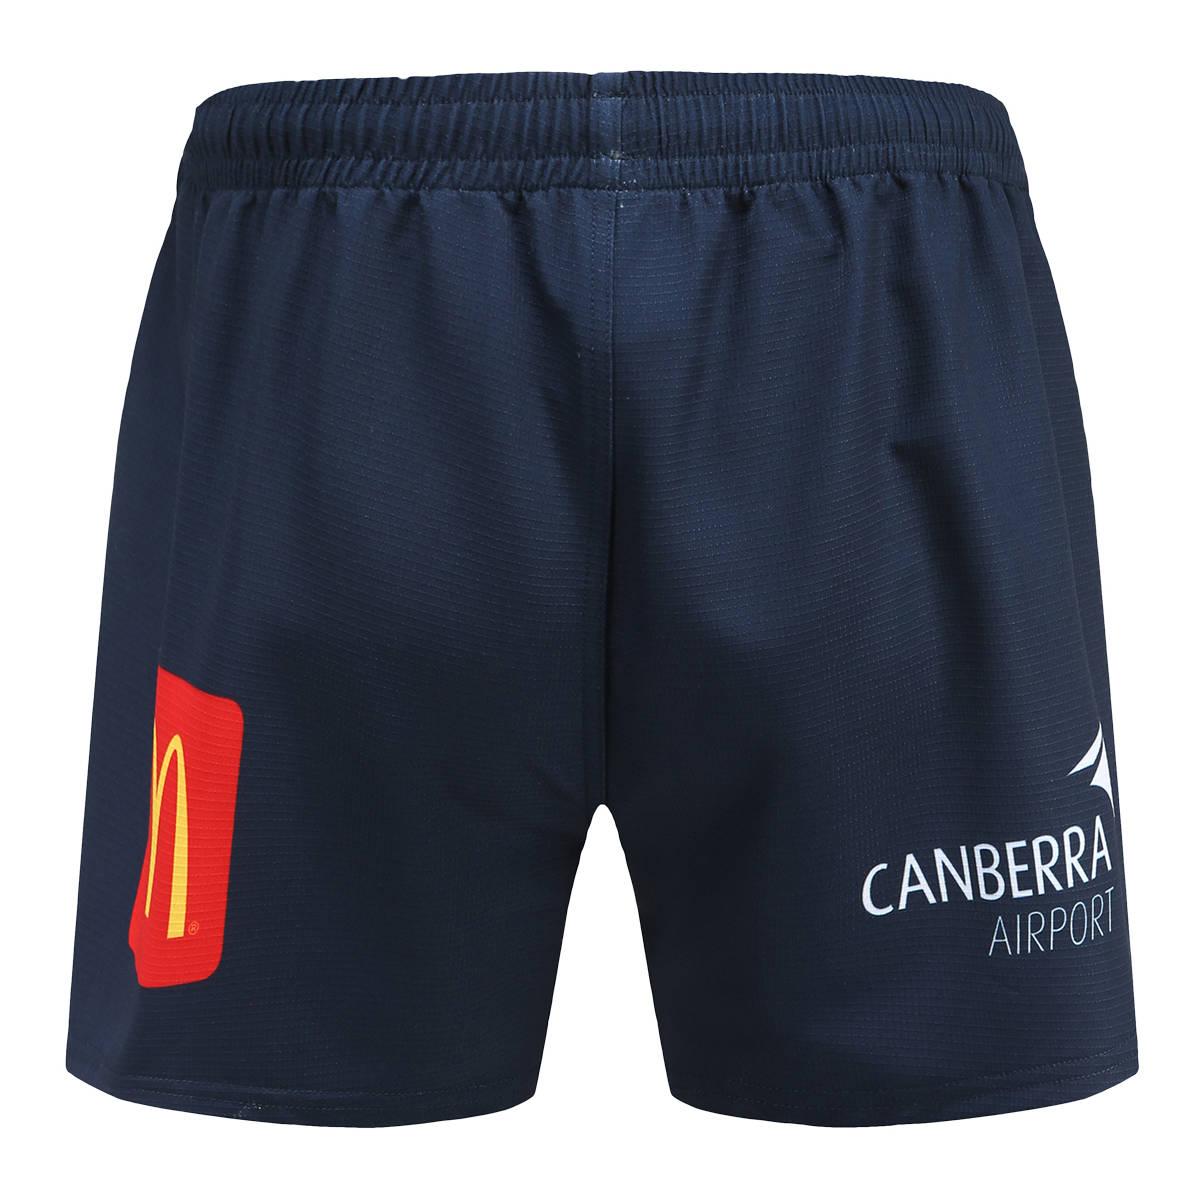 2021 Home Shorts1